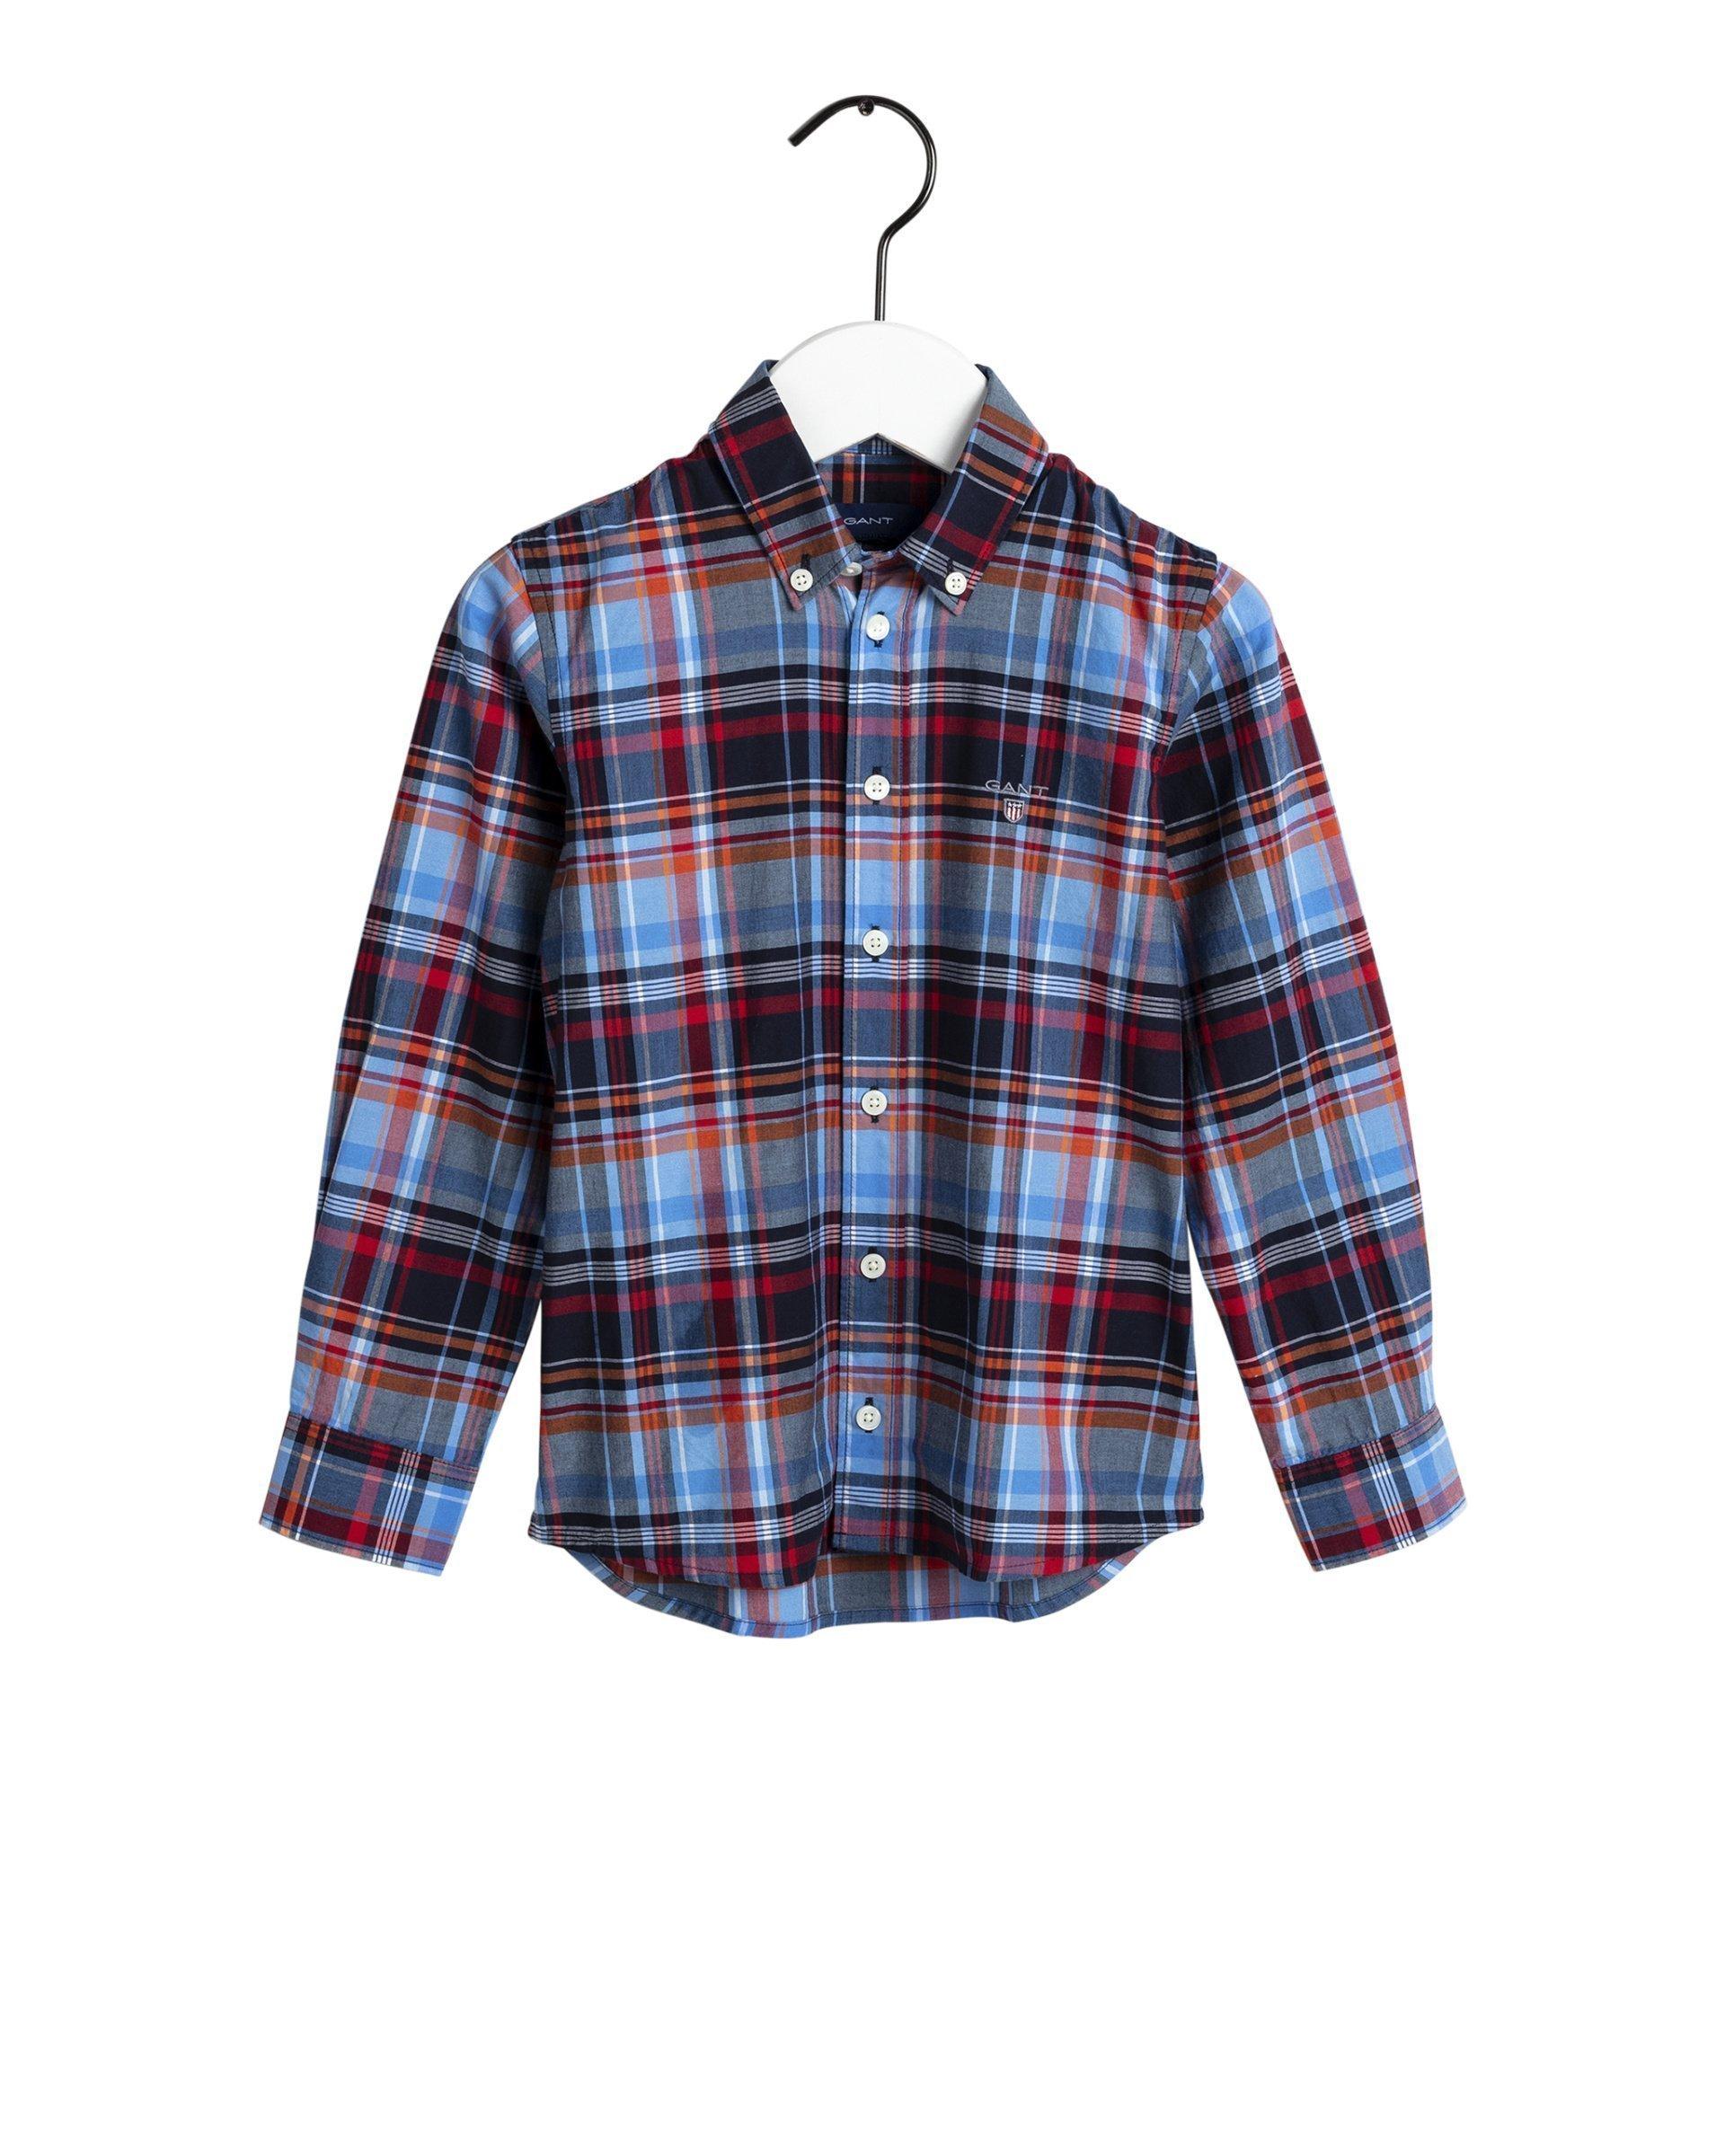 Lasten Gant, preppy madras shirt kauluspaita